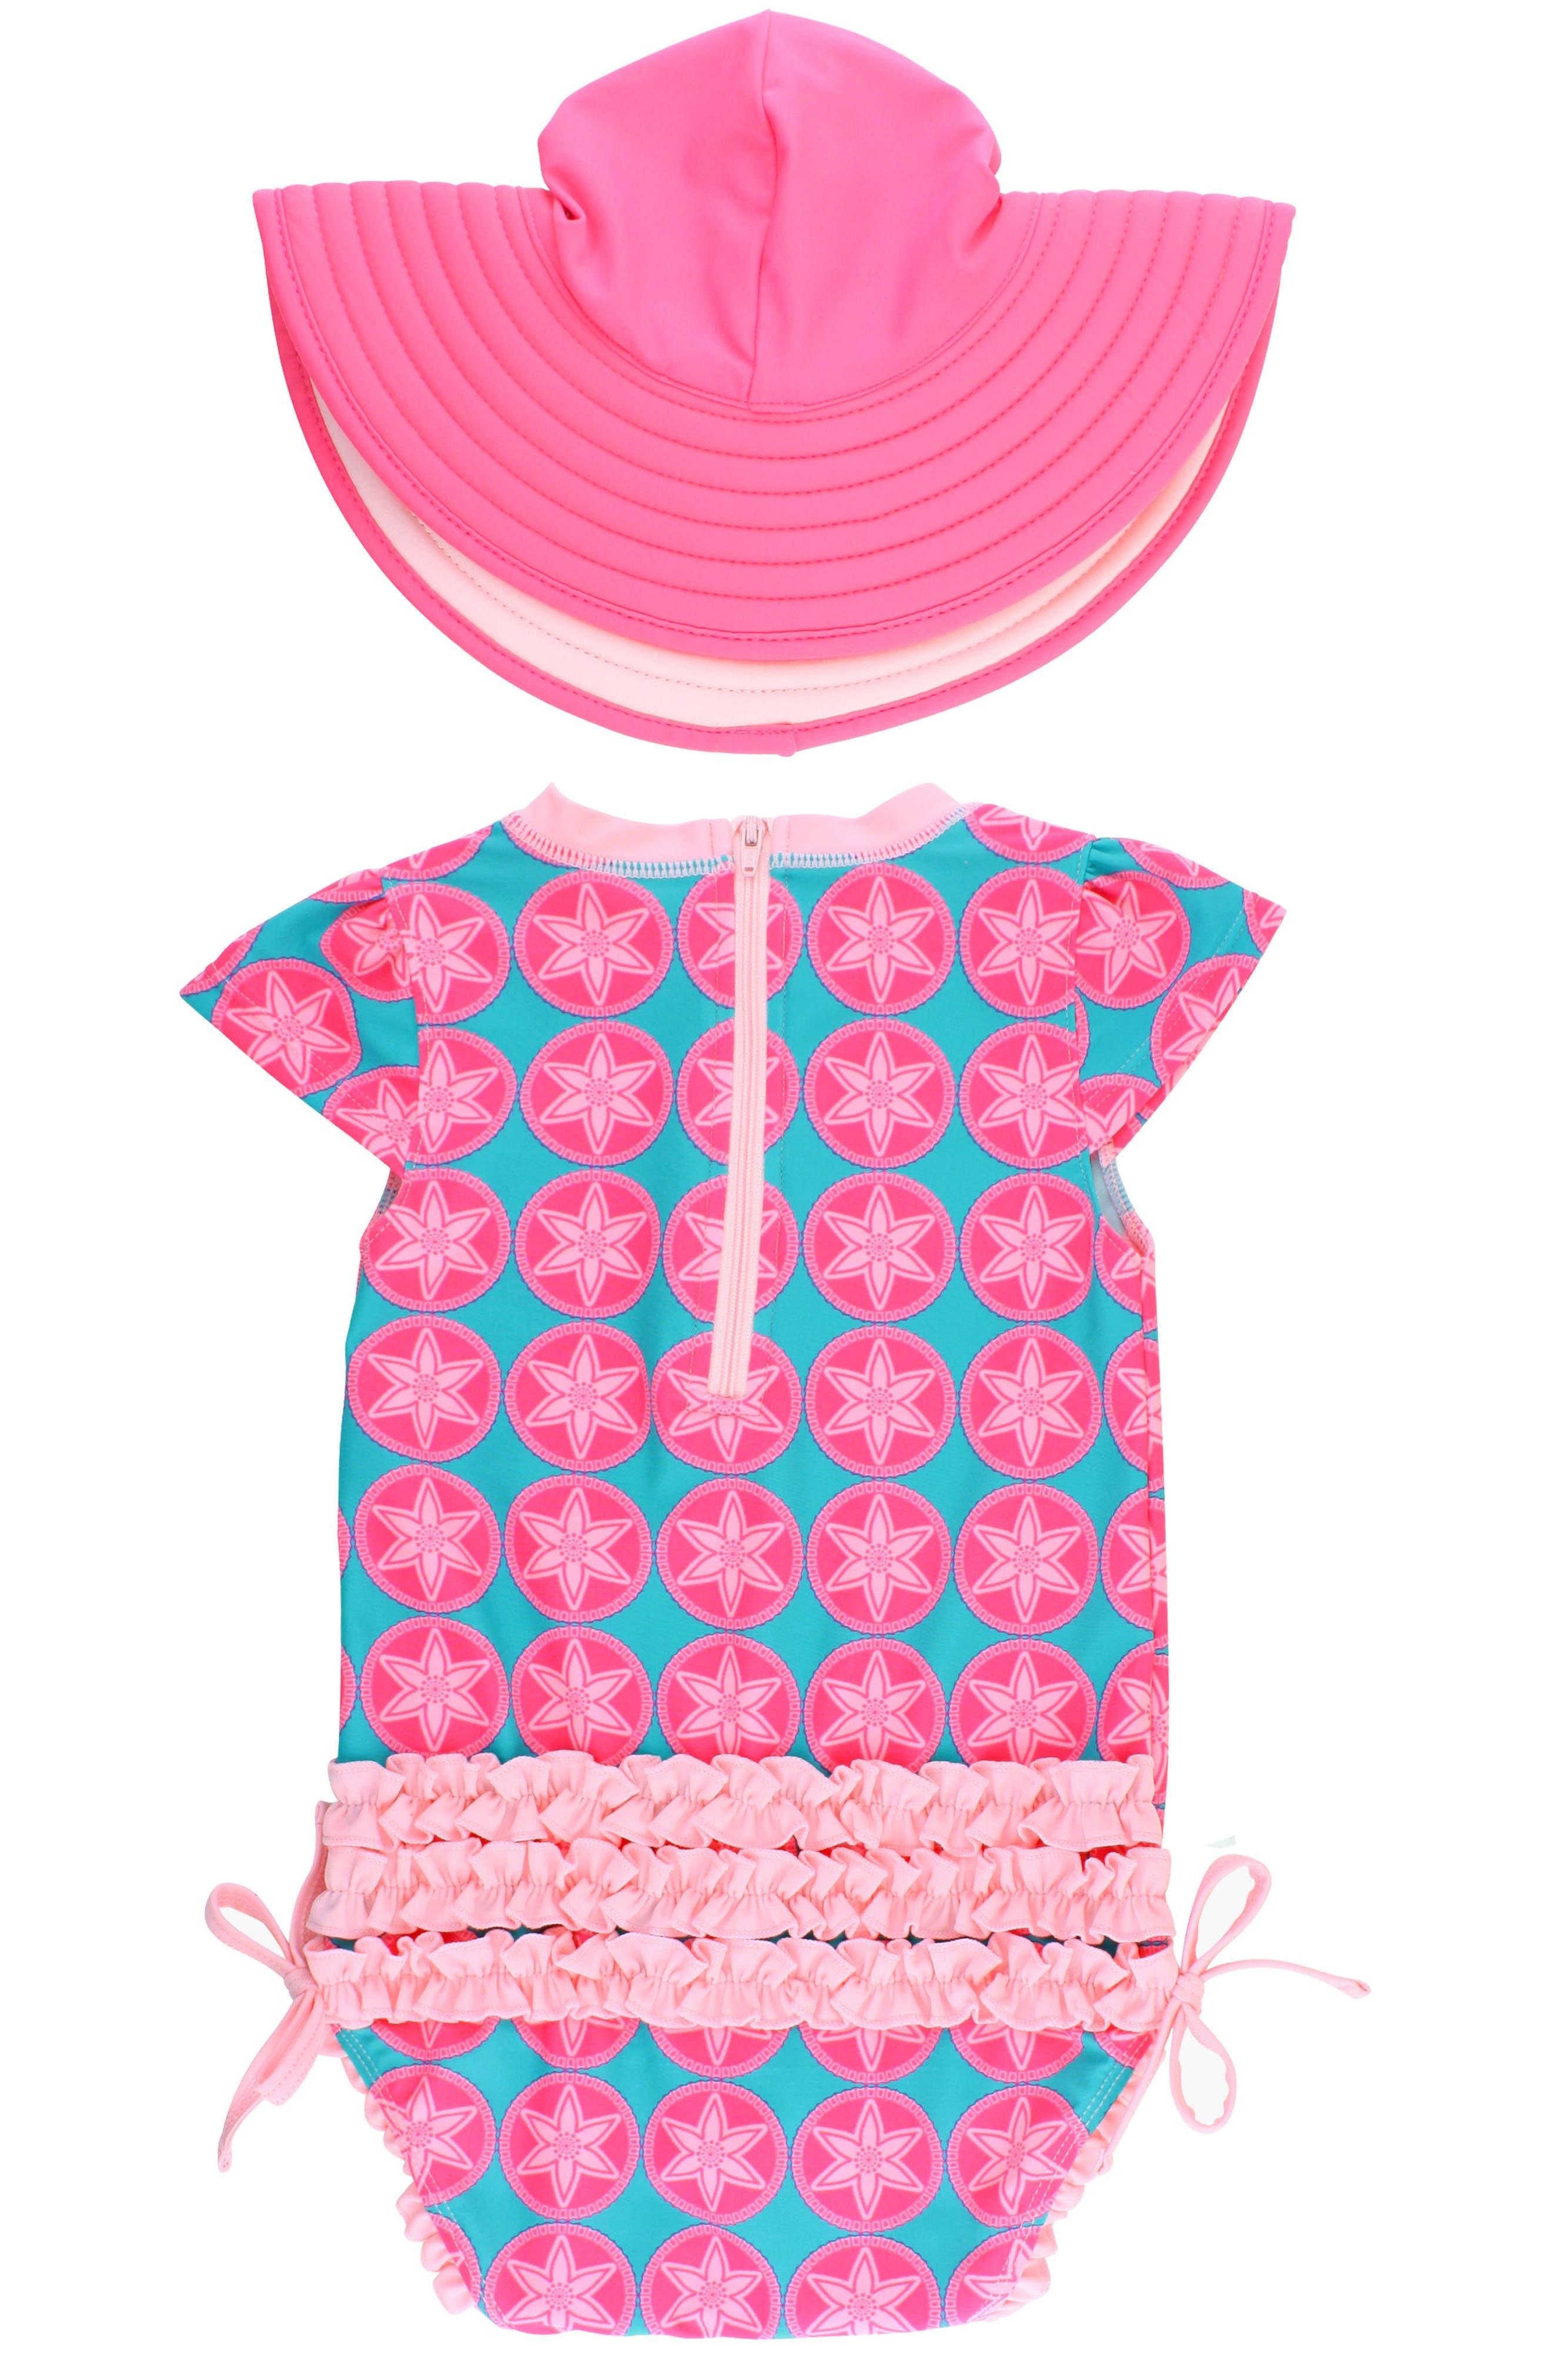 Alternate Image 2  - RuffleButts Salt Water Taffy One-Piece Swimsuit & Hat Set (Baby Girls)